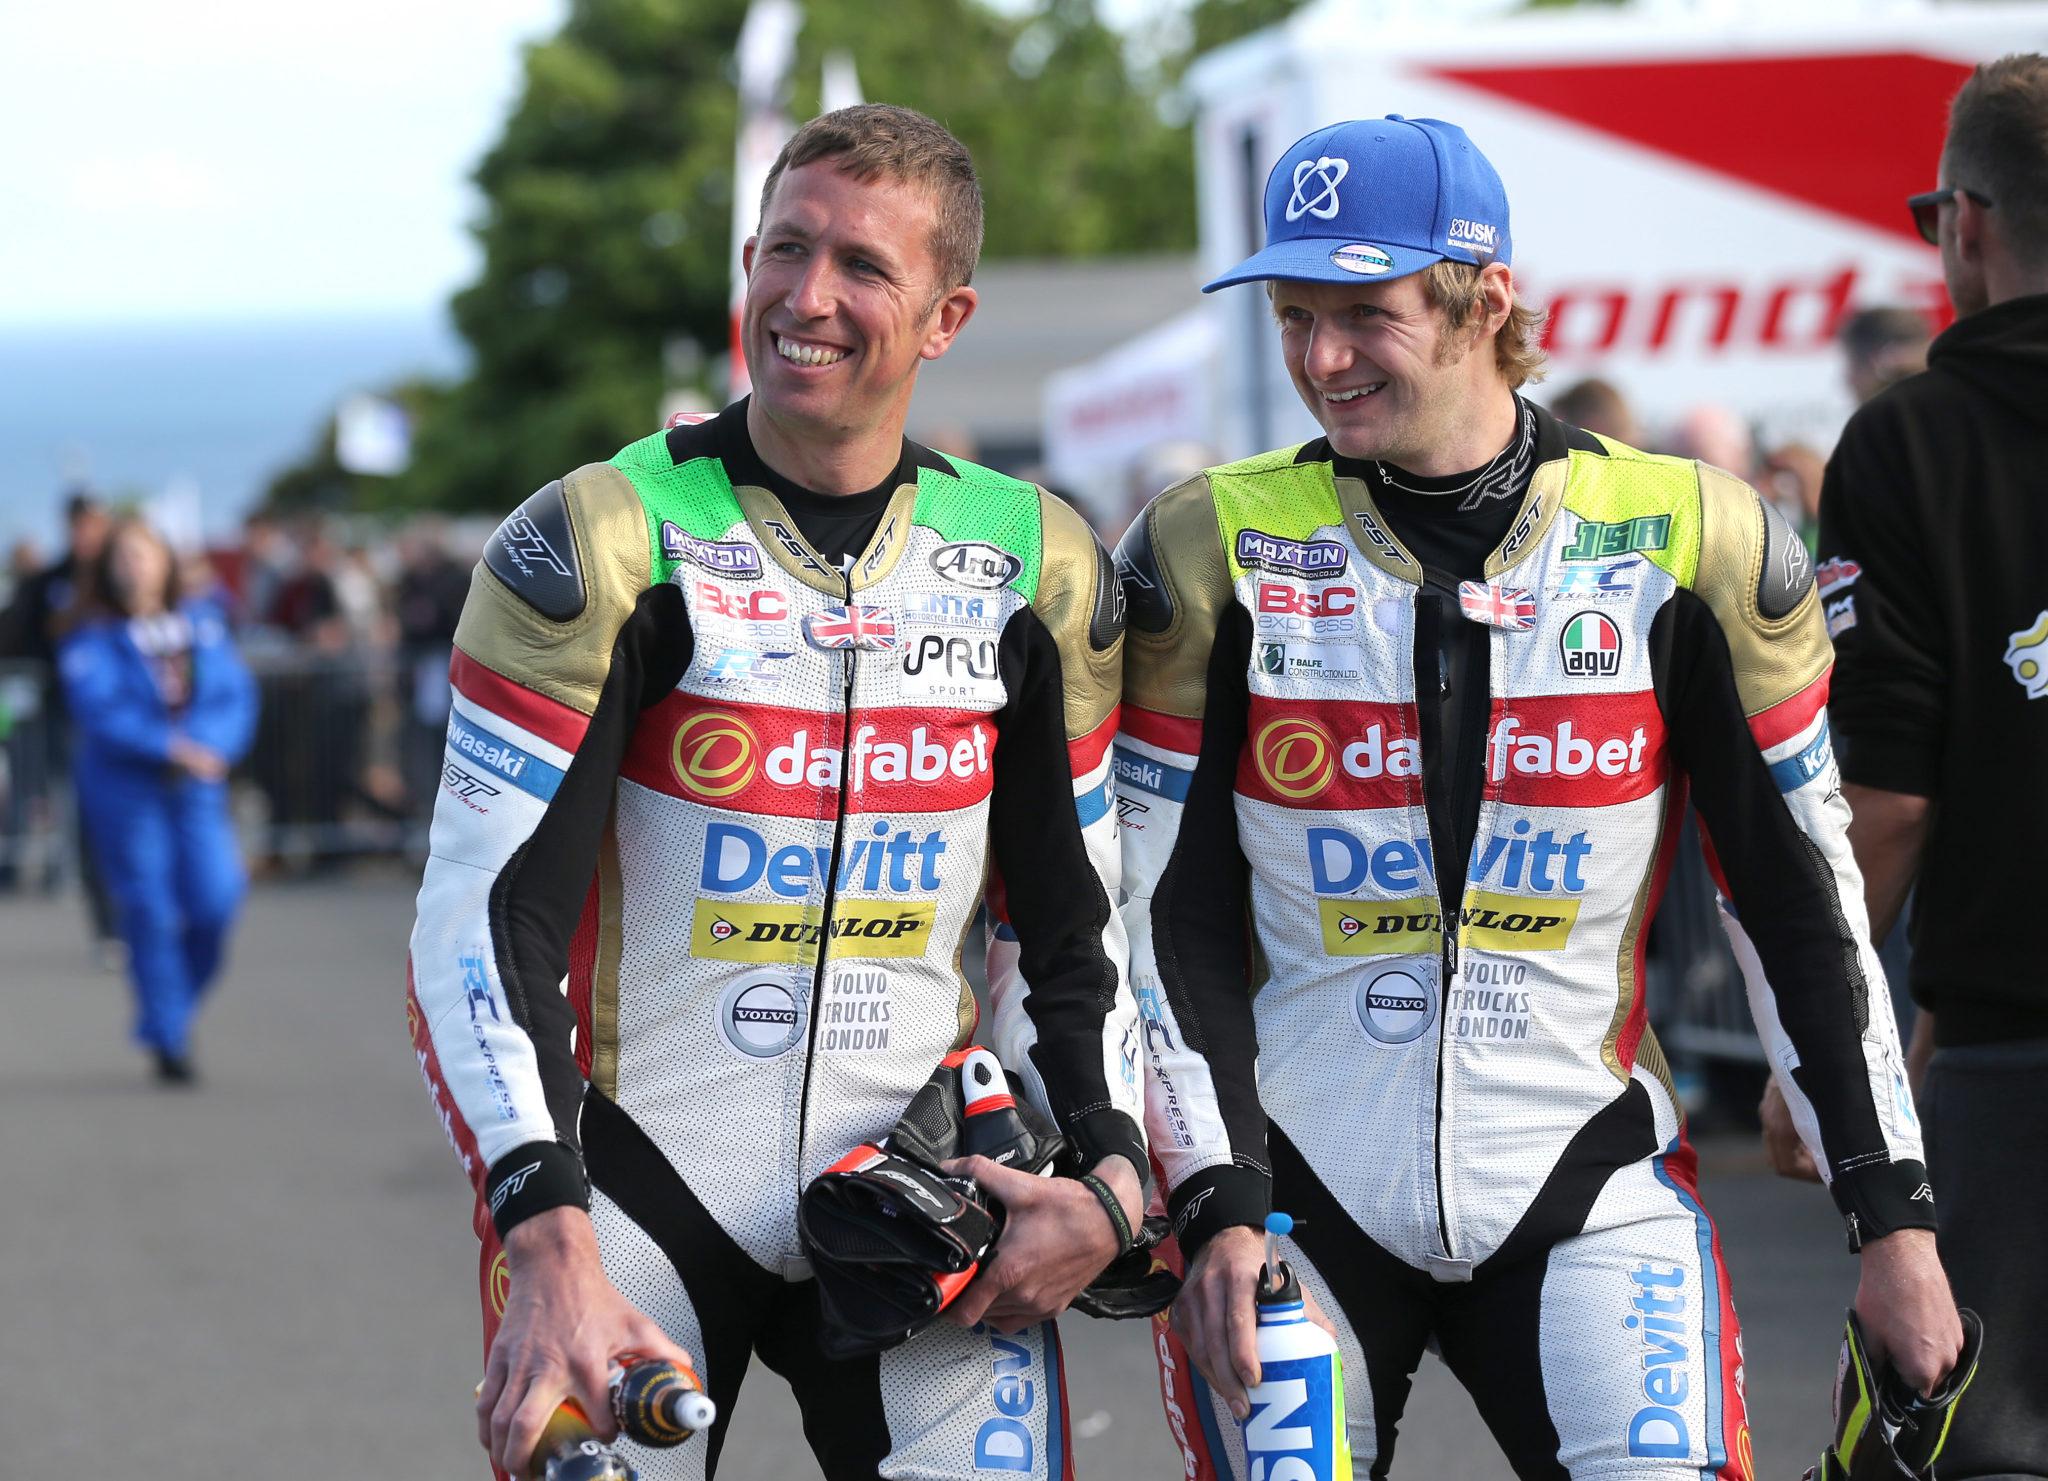 Teammates Steve Mercer and Ivan Lintin iomtt 2017 image credit Dafabet Devitt Racing